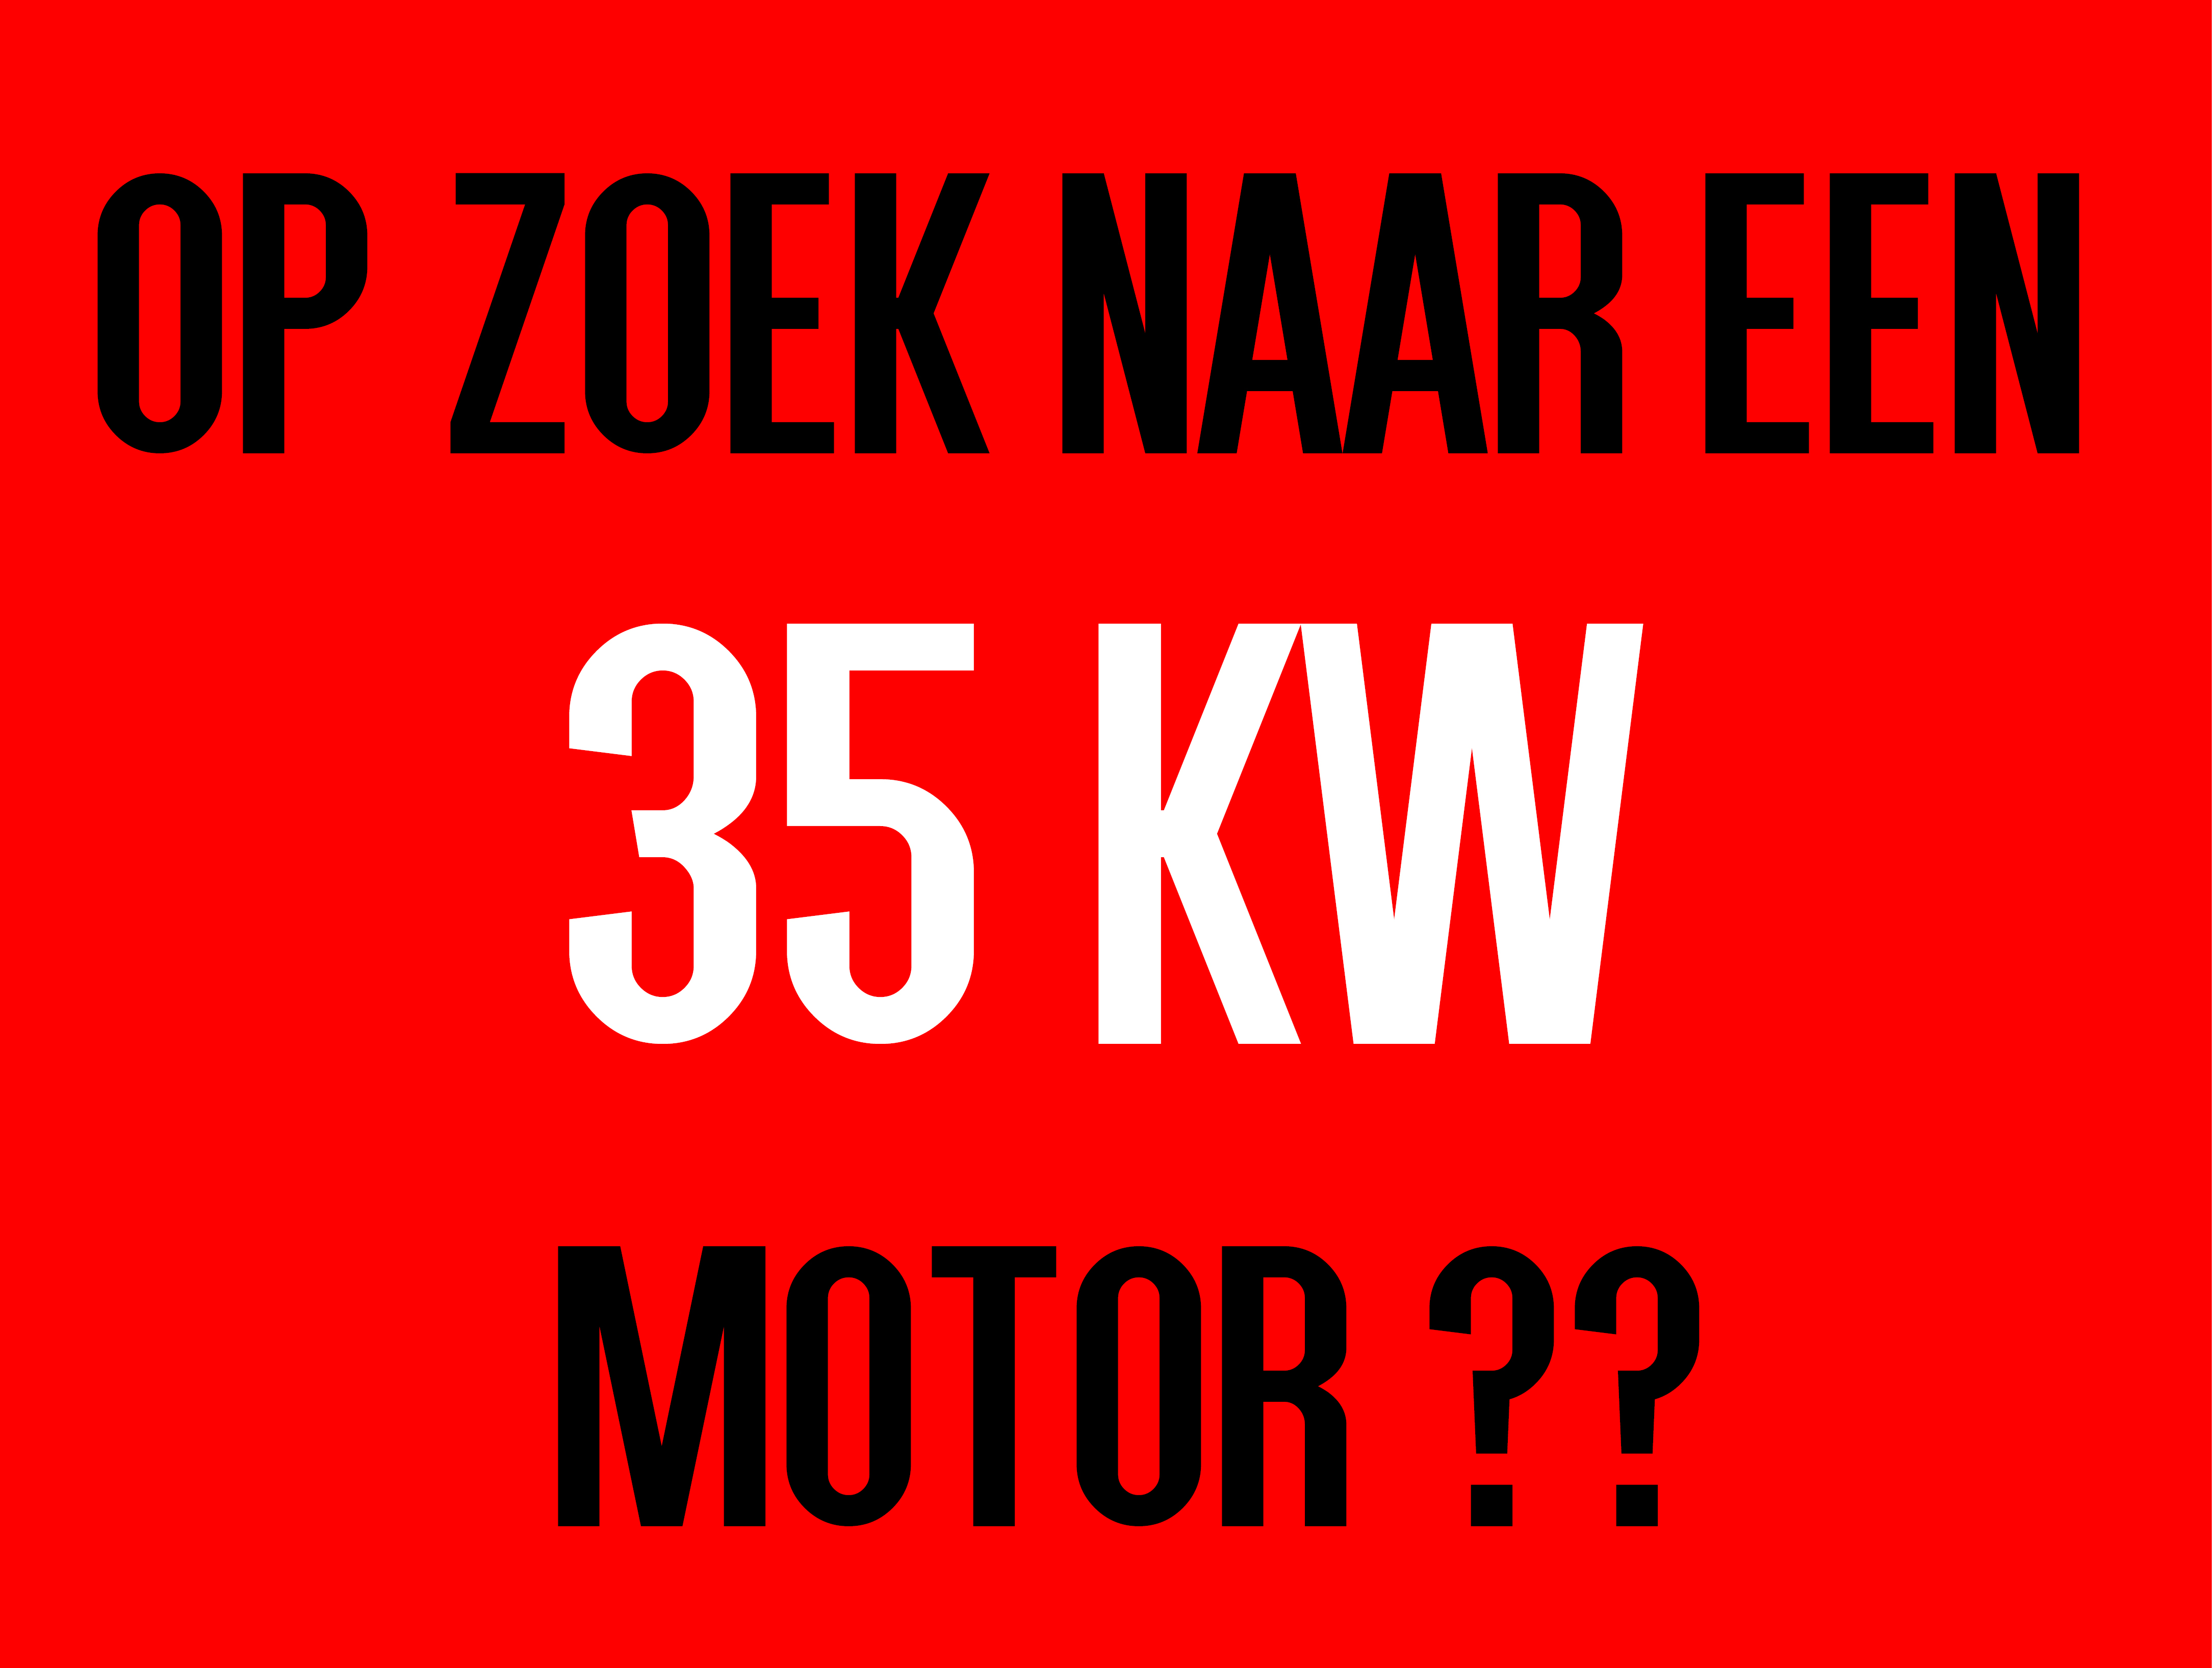 35 kW motor